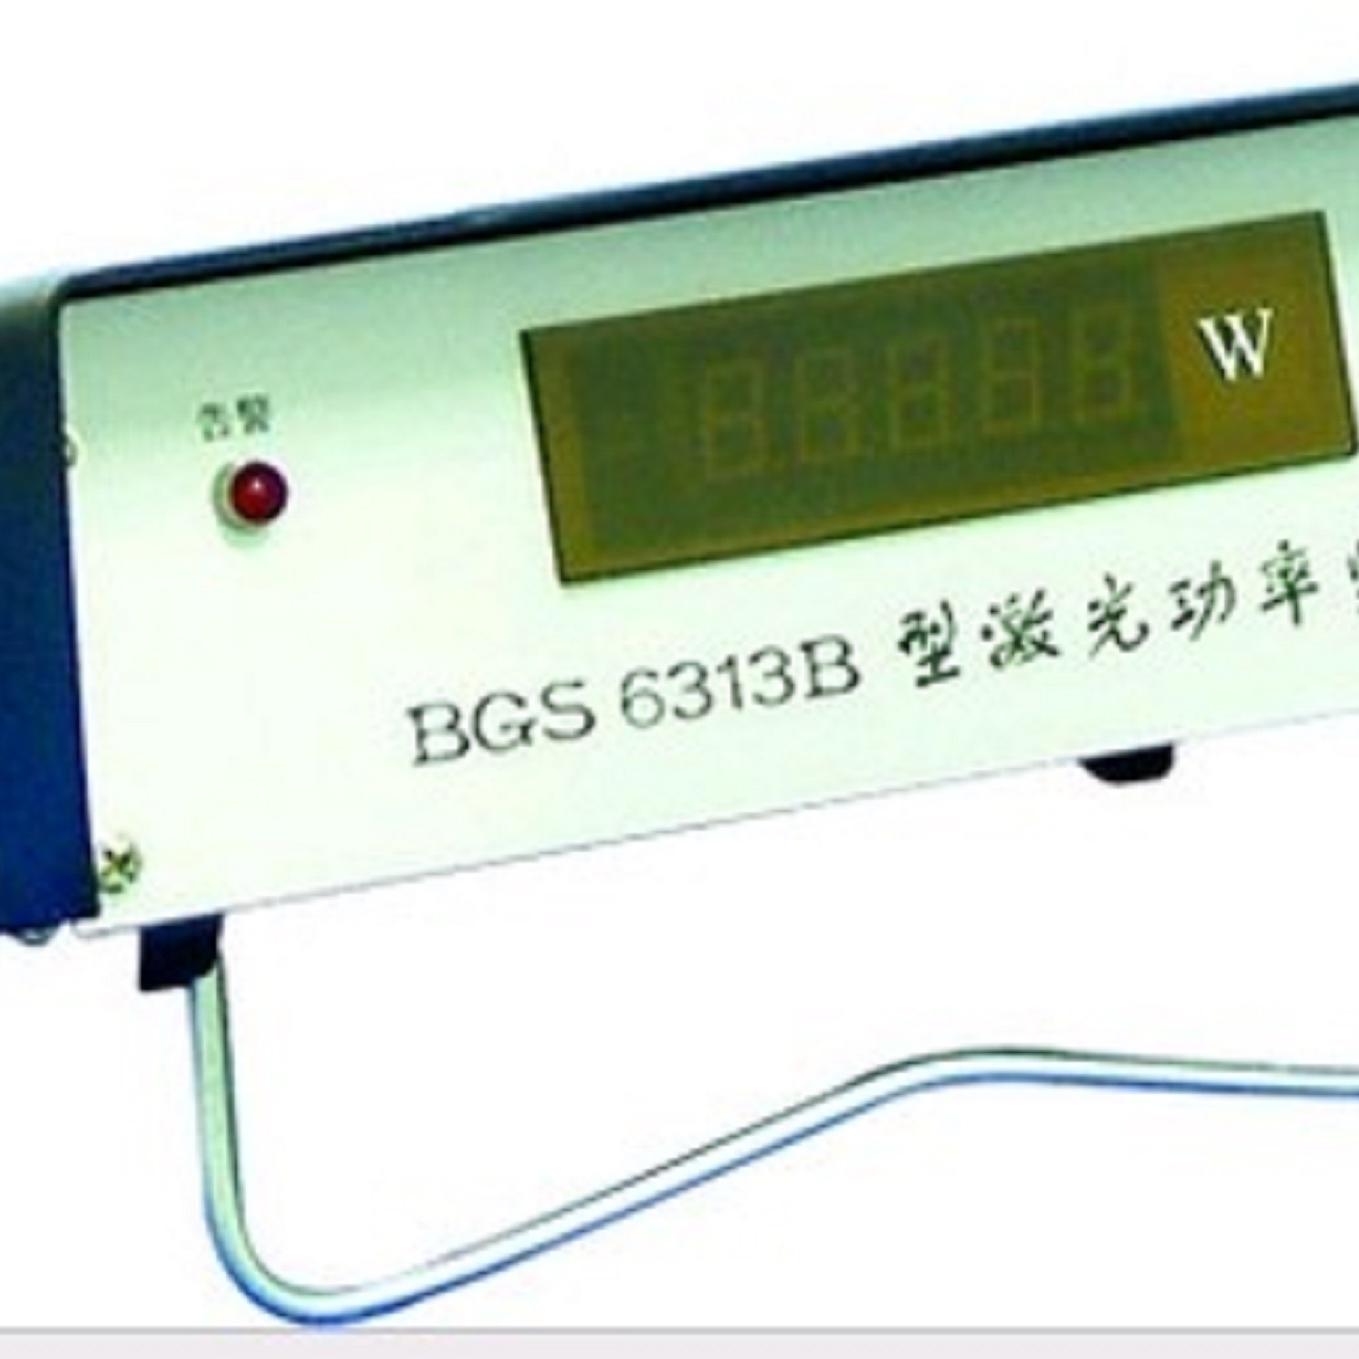 新型激光功率监测仪